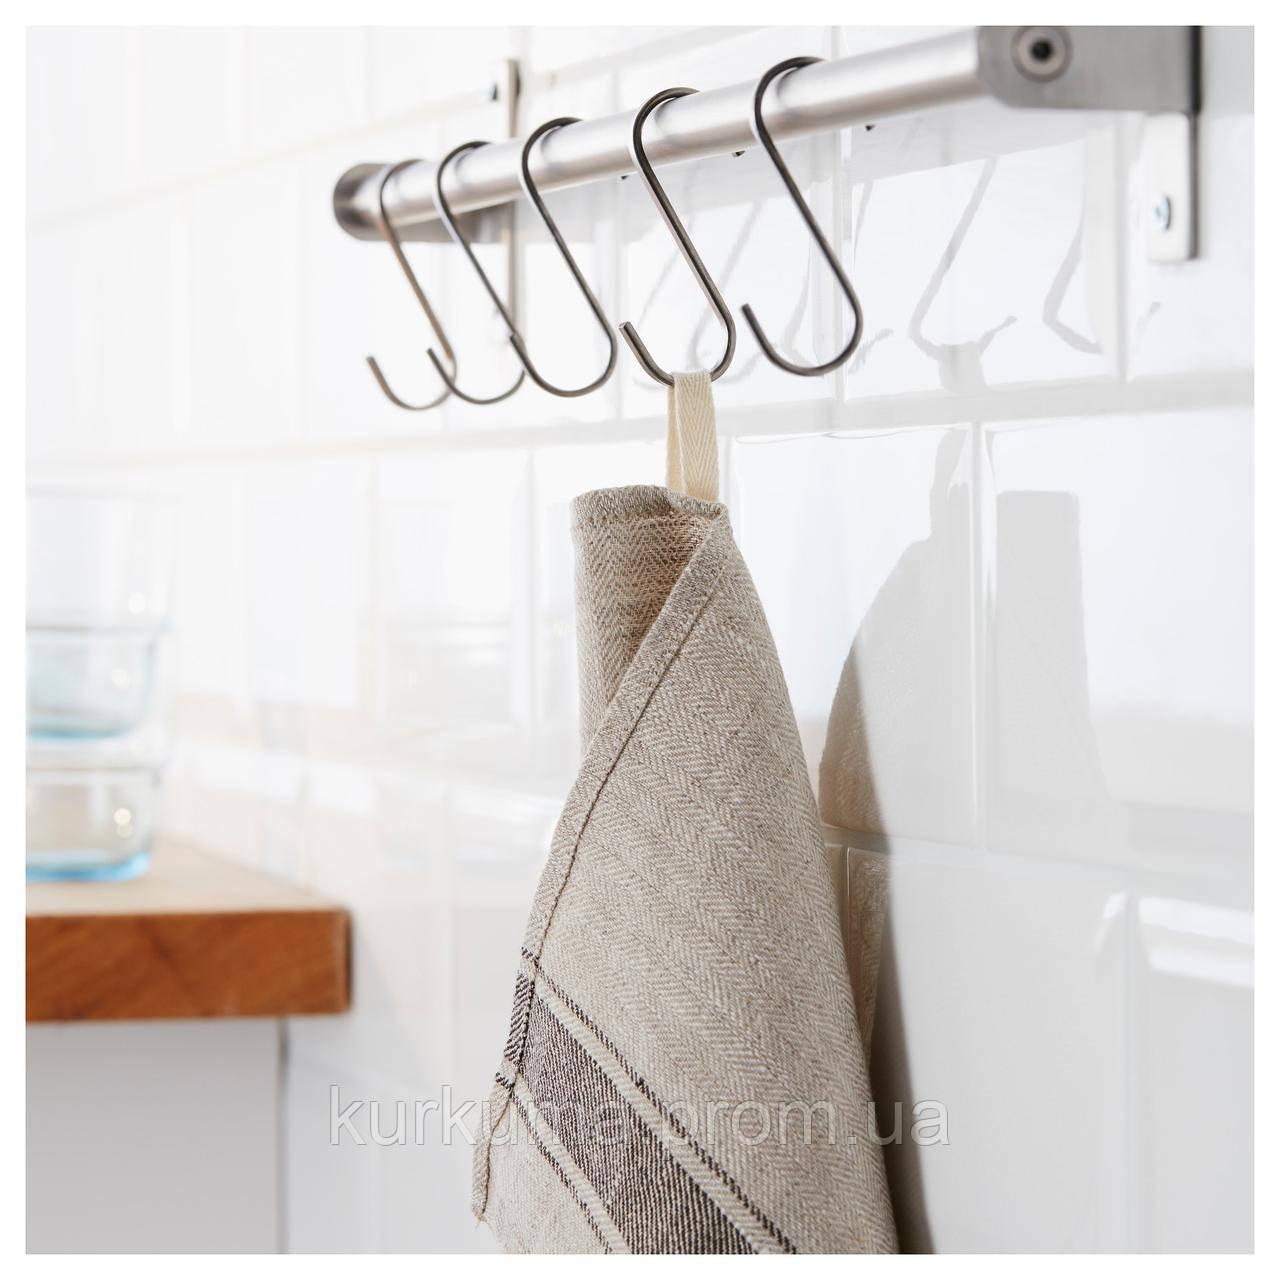 IKEA VARDAGEN Кухонное полотенце, бежевый  (802.926.36)